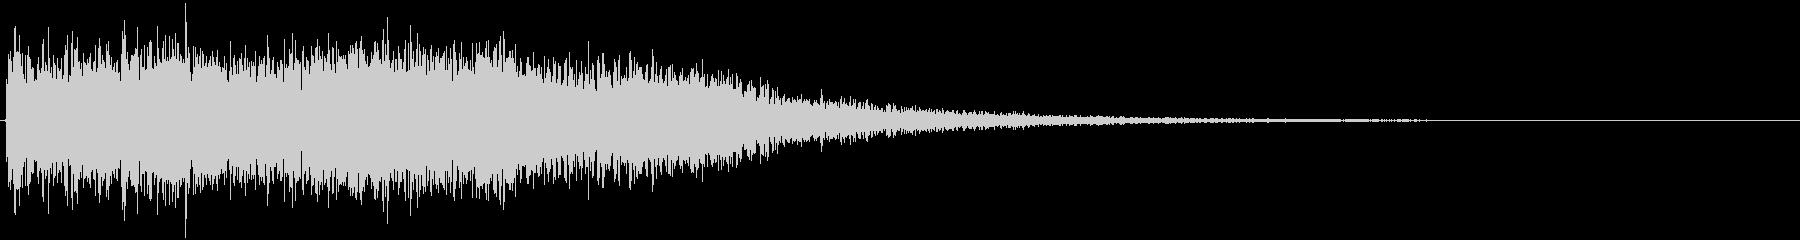 CINEMATIC BRAAMS_07の未再生の波形